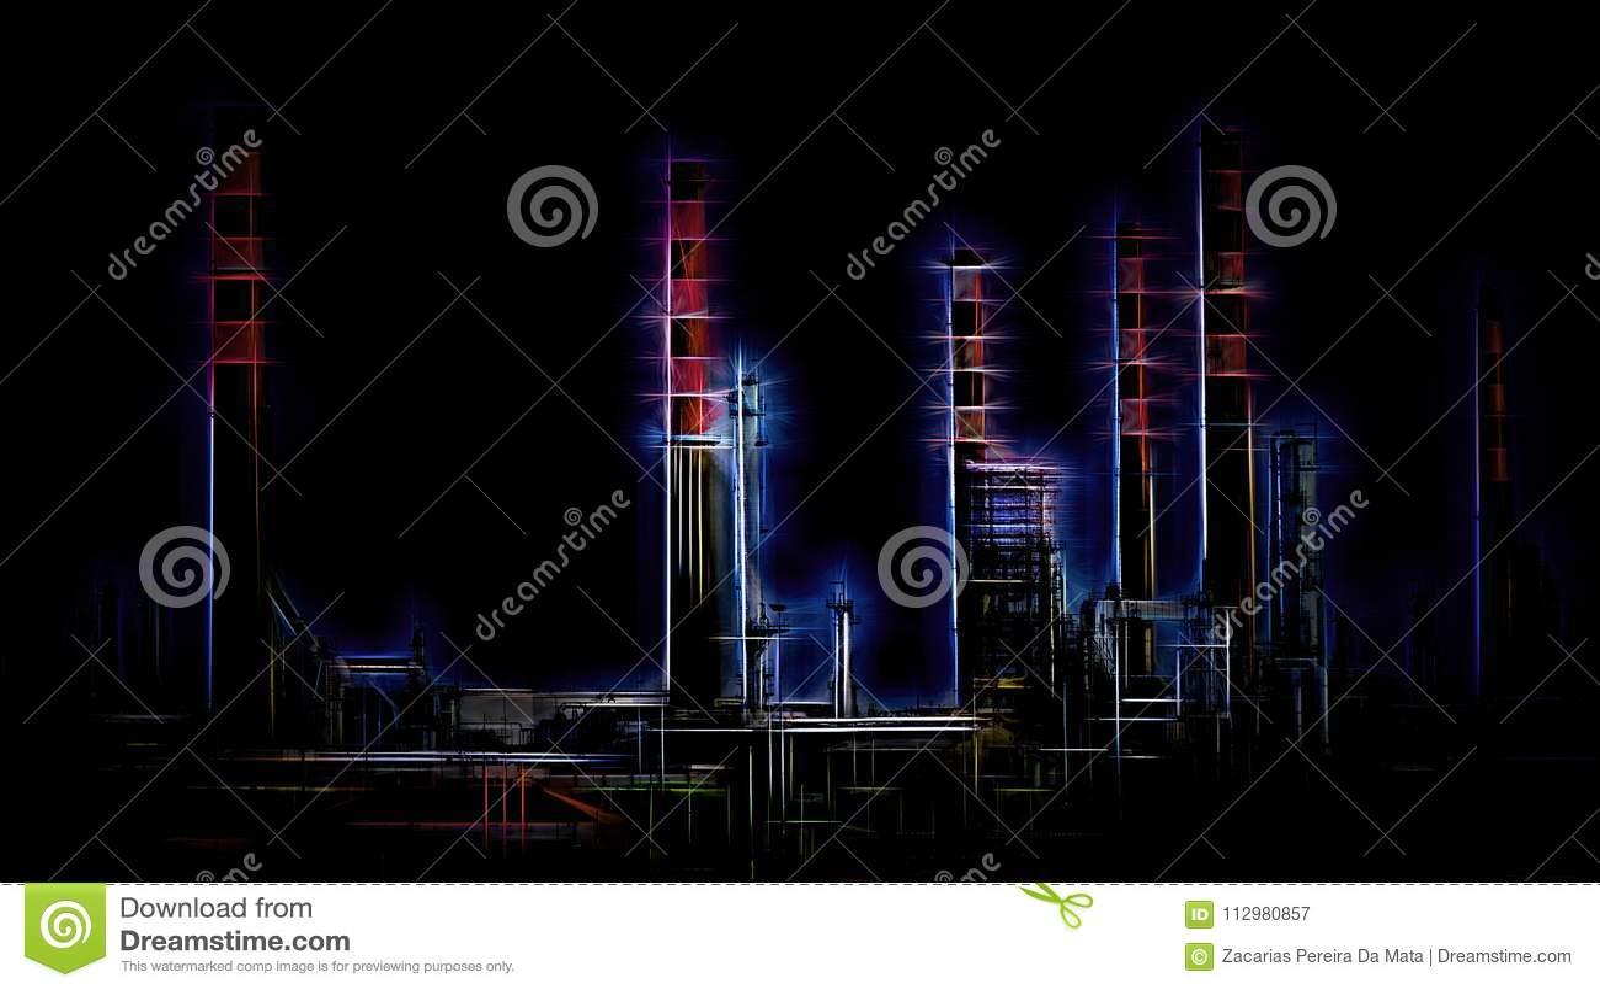 Stylized oil refinery